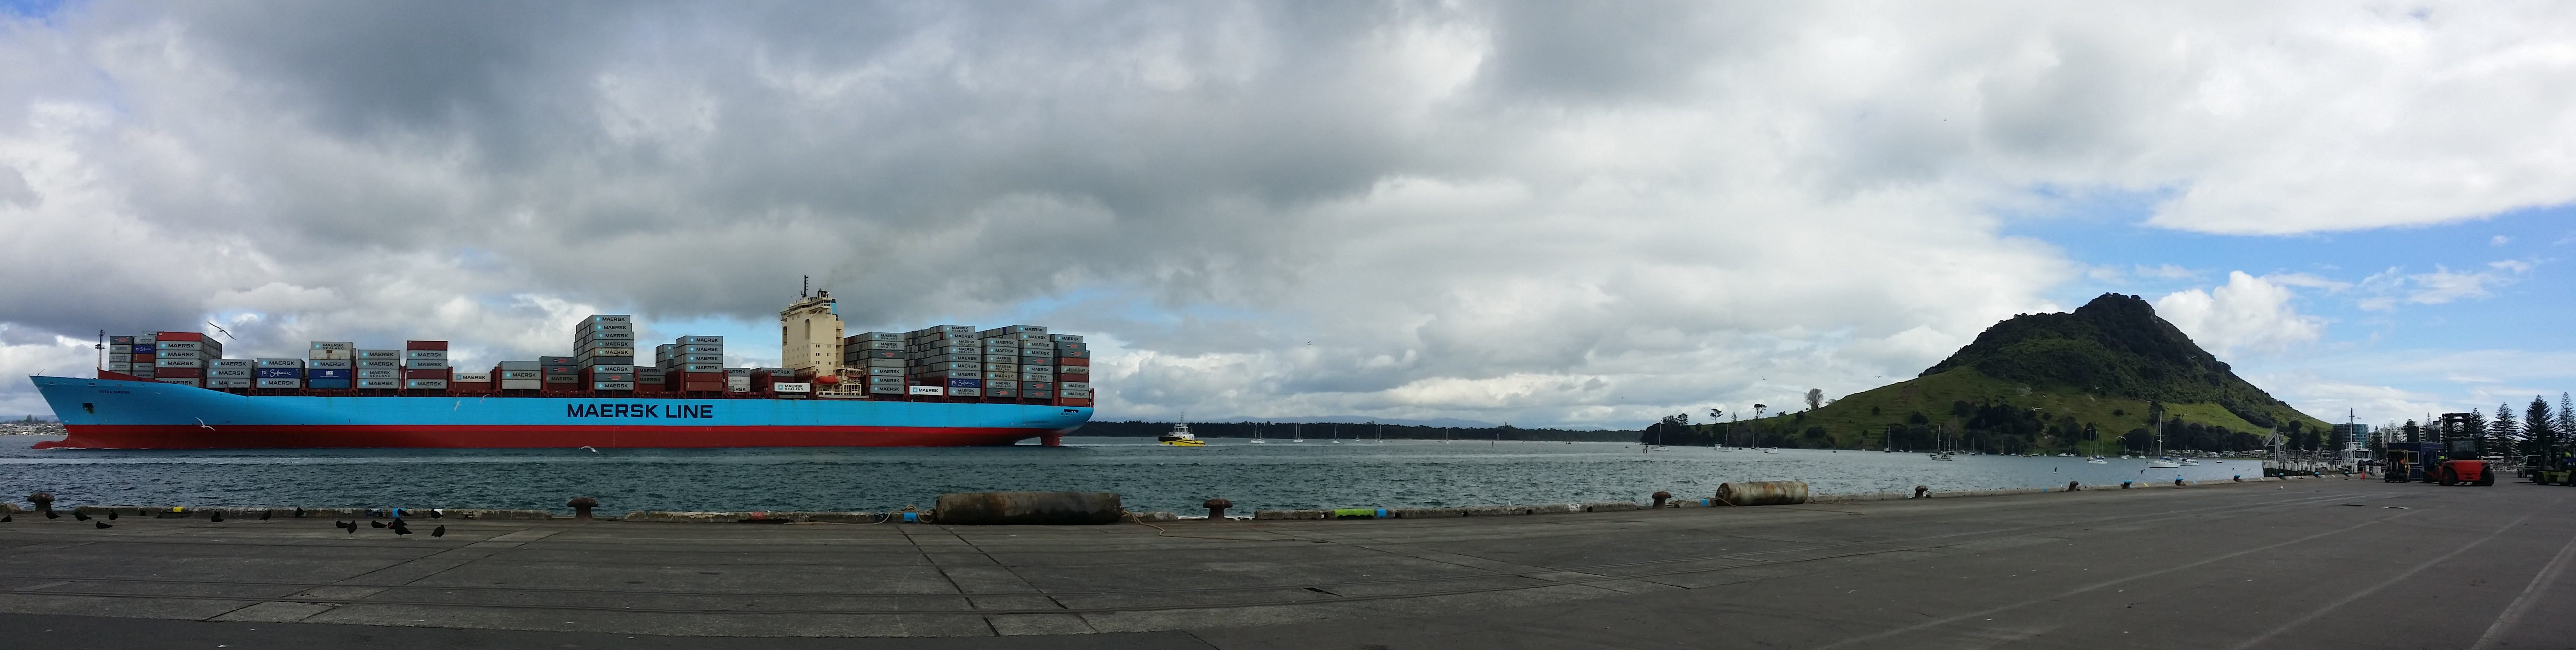 Name:  Mega Maersk.jpg Views: 195 Size:  2.56 MB